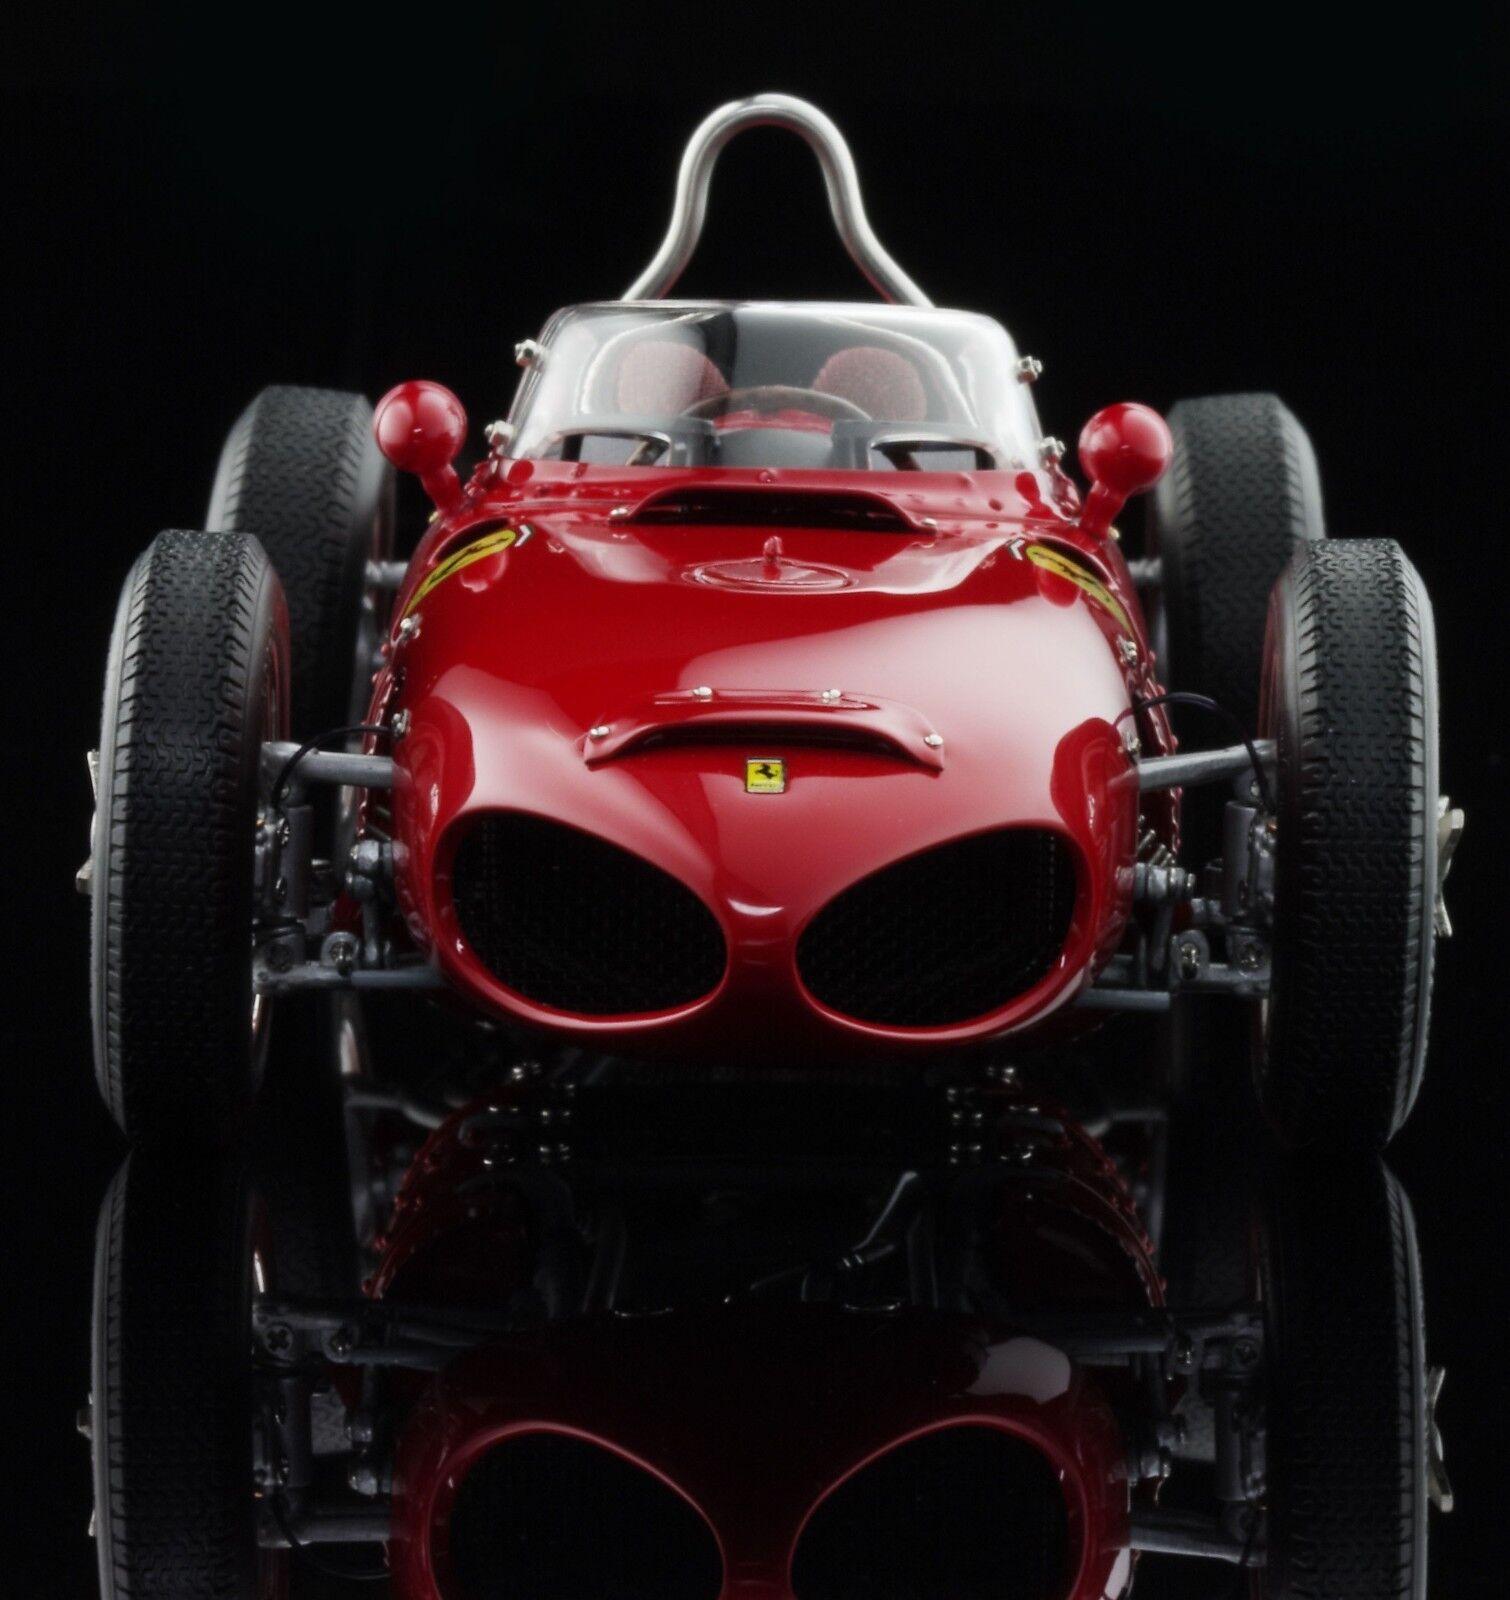 CMC Modelcars M-070 - Ferrari, Ferrari, Ferrari, Dino 156 F1 (Sharknose) 1961- Nr.2 - Maßstab 1 18 96c975